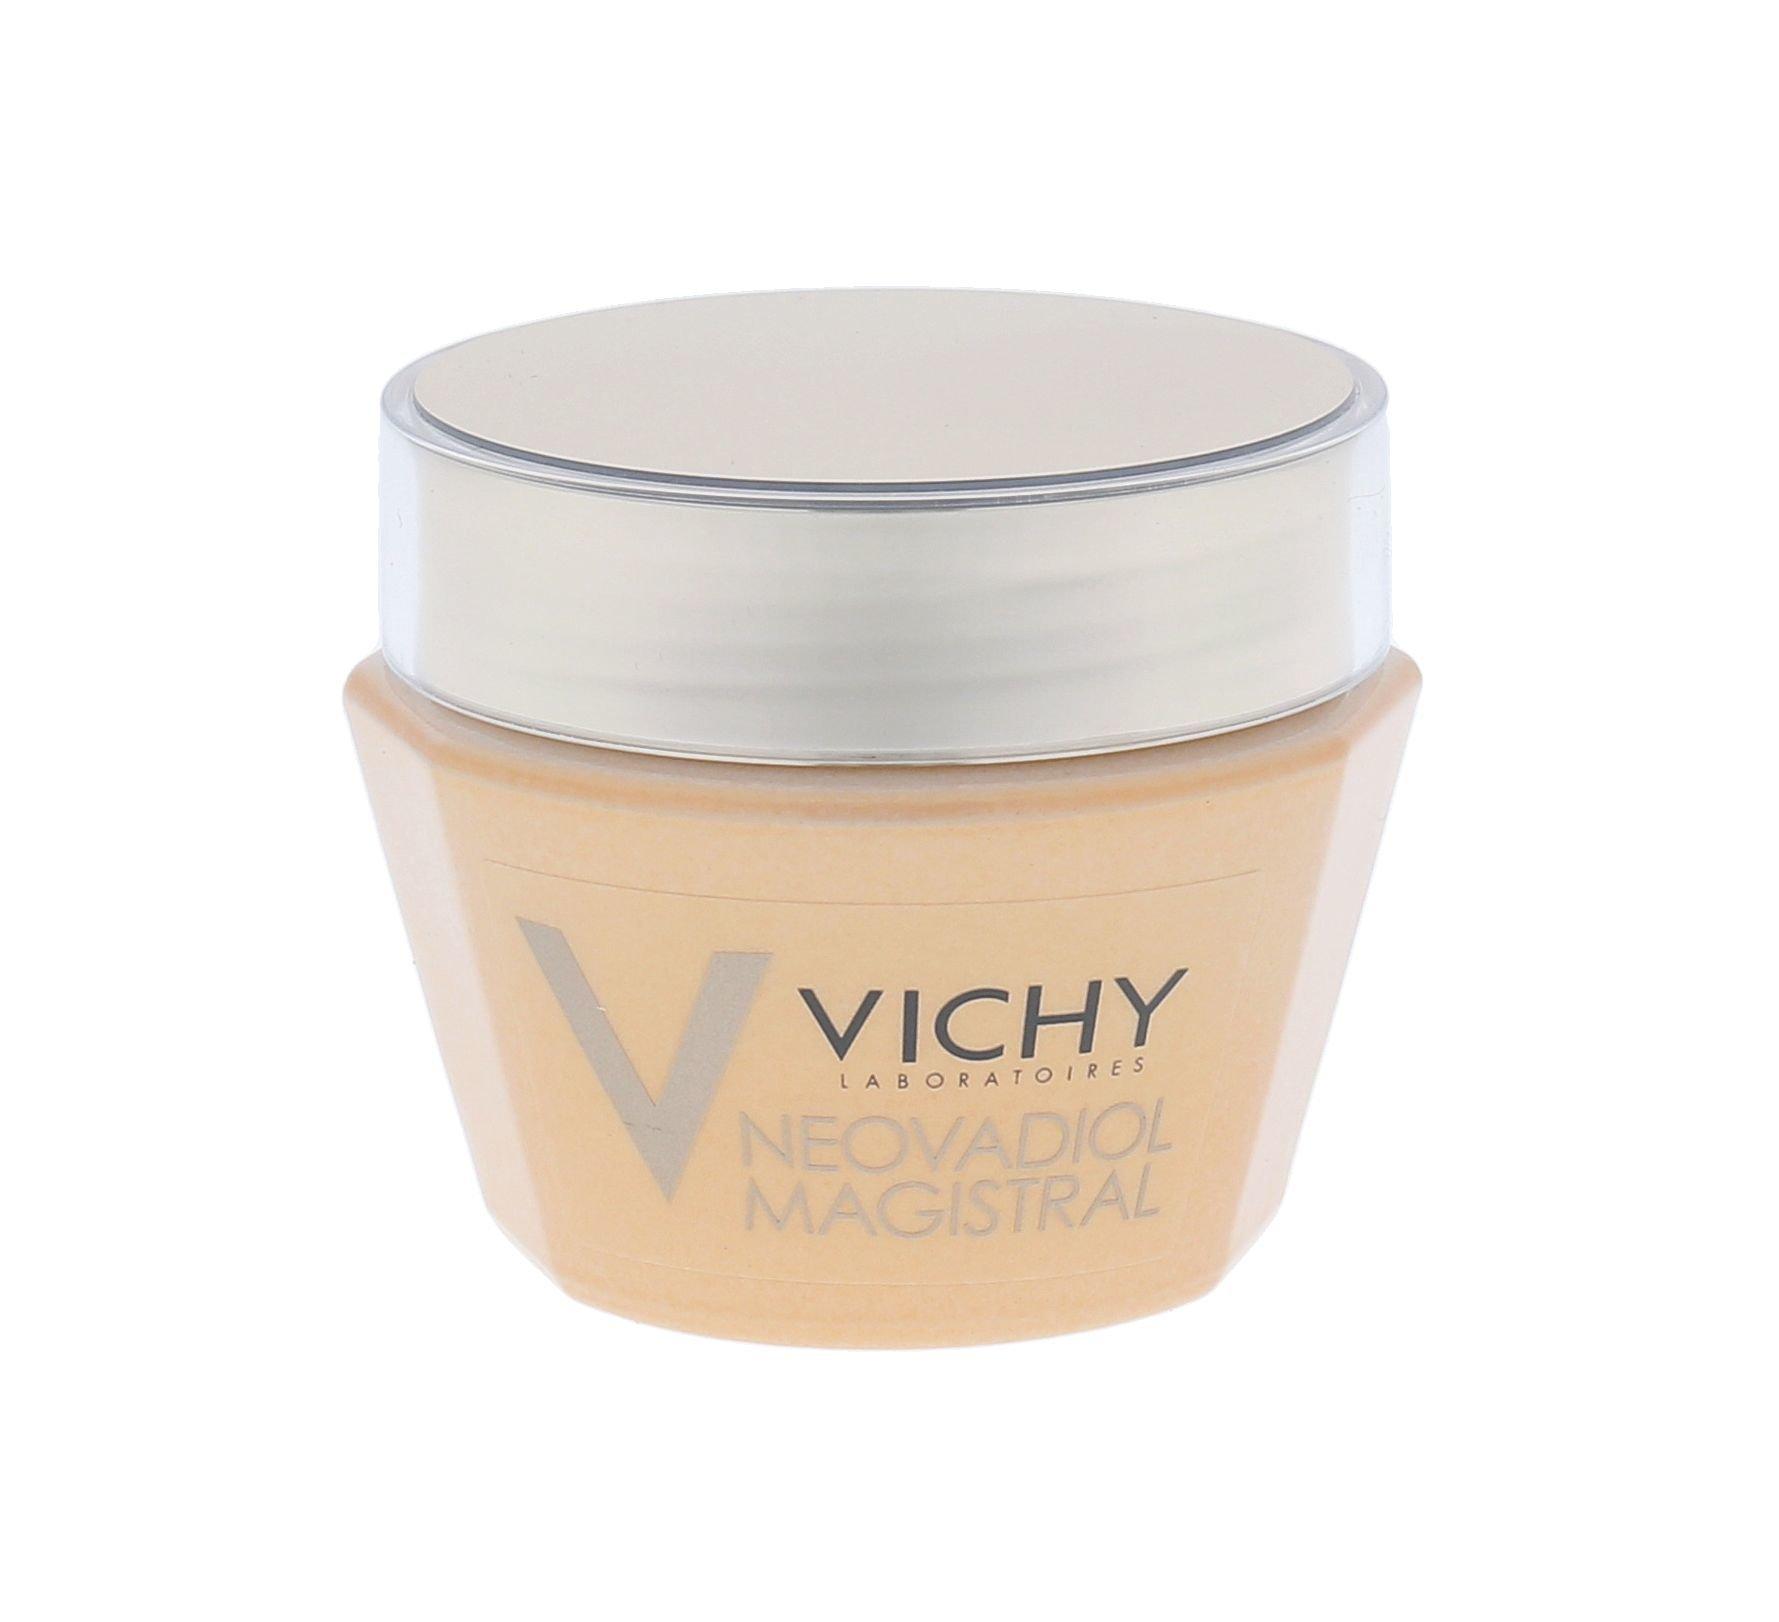 Vichy Neovadiol Magistral Cosmetic 50ml